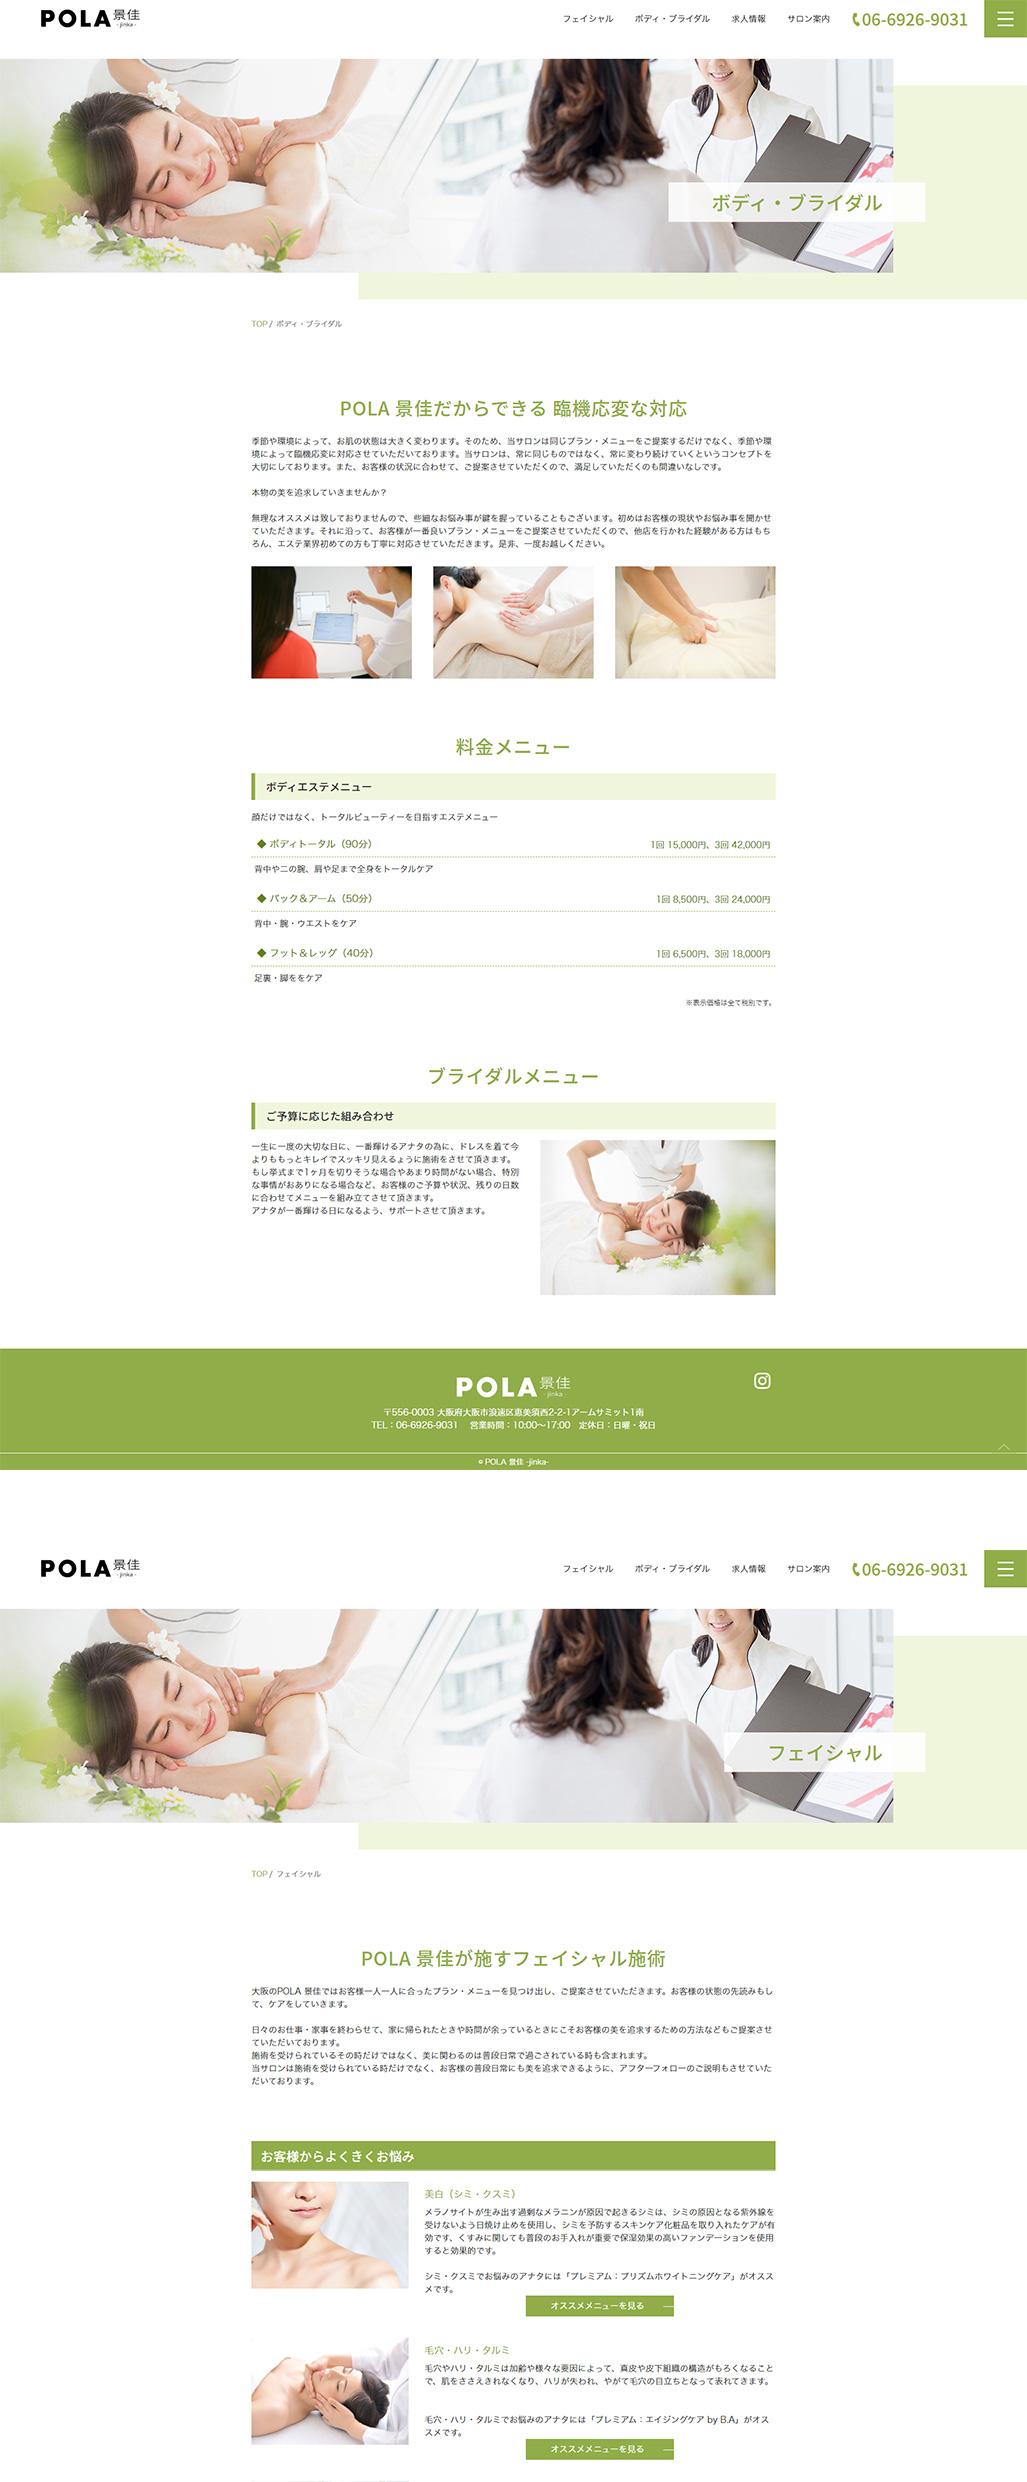 POLA 景佳 -jinka-PC画像2